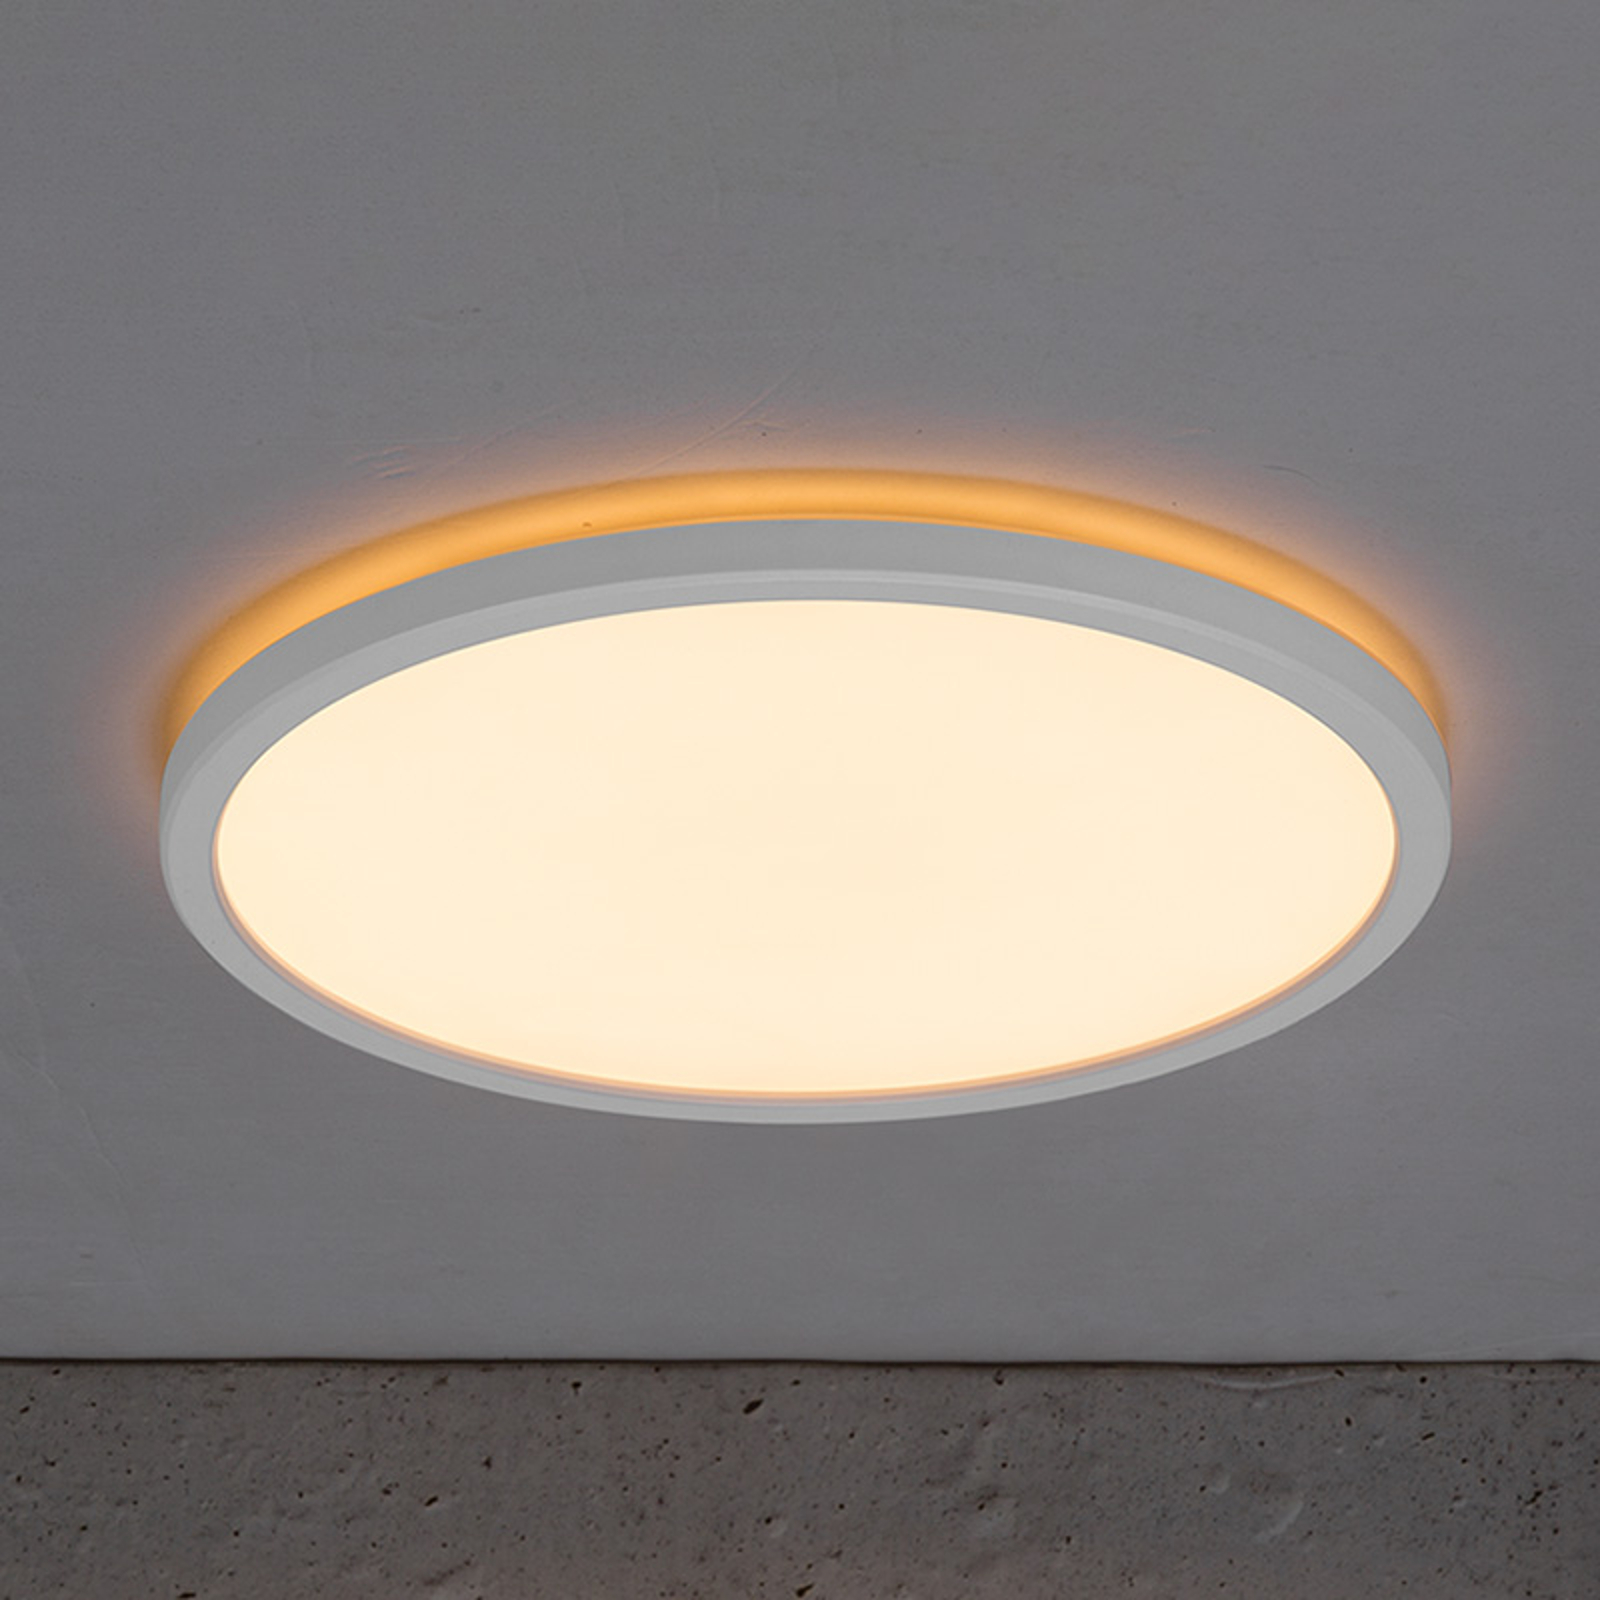 Lampa sufitowa LED Bronx 2700 K, Ø 29 cm